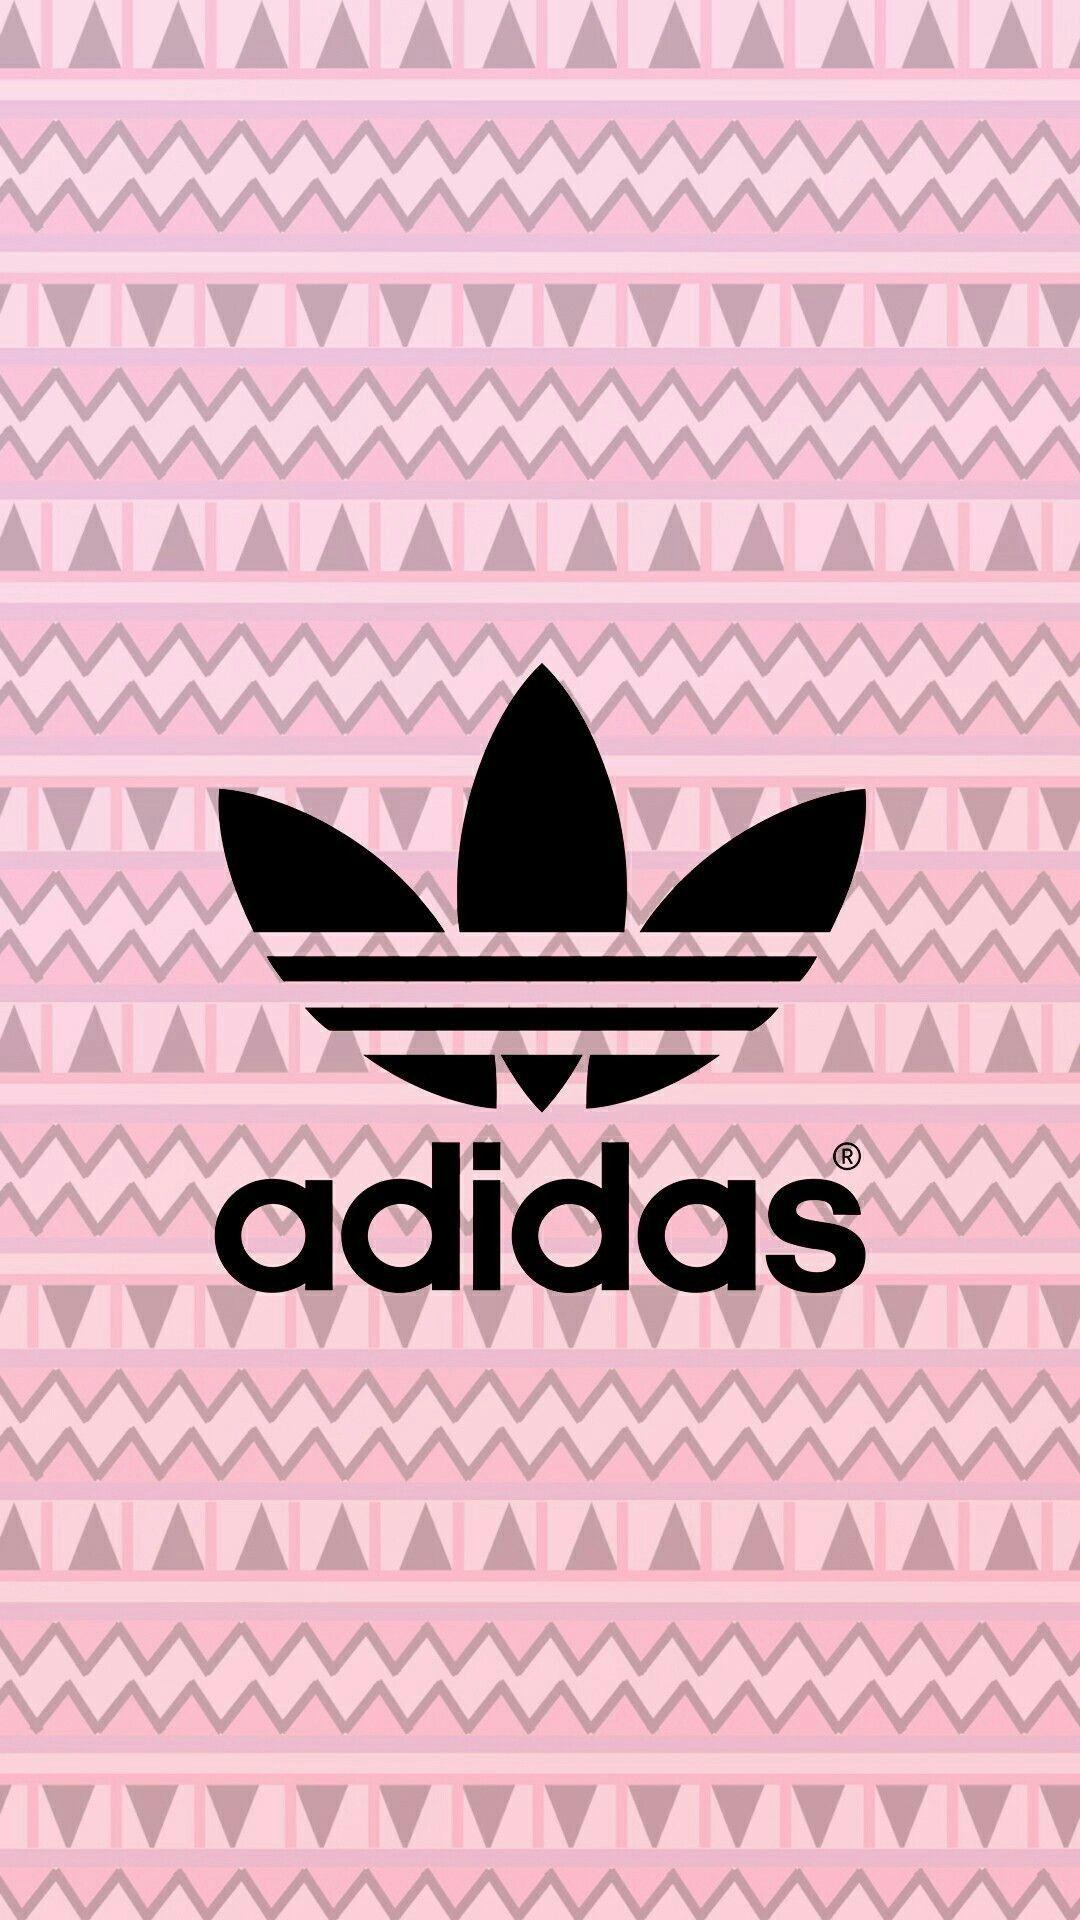 Adidas Girly Wallpaper Home Screen Adidas Wallpapers Adidas Logo Wallpapers Adidas Wallpaper Iphone